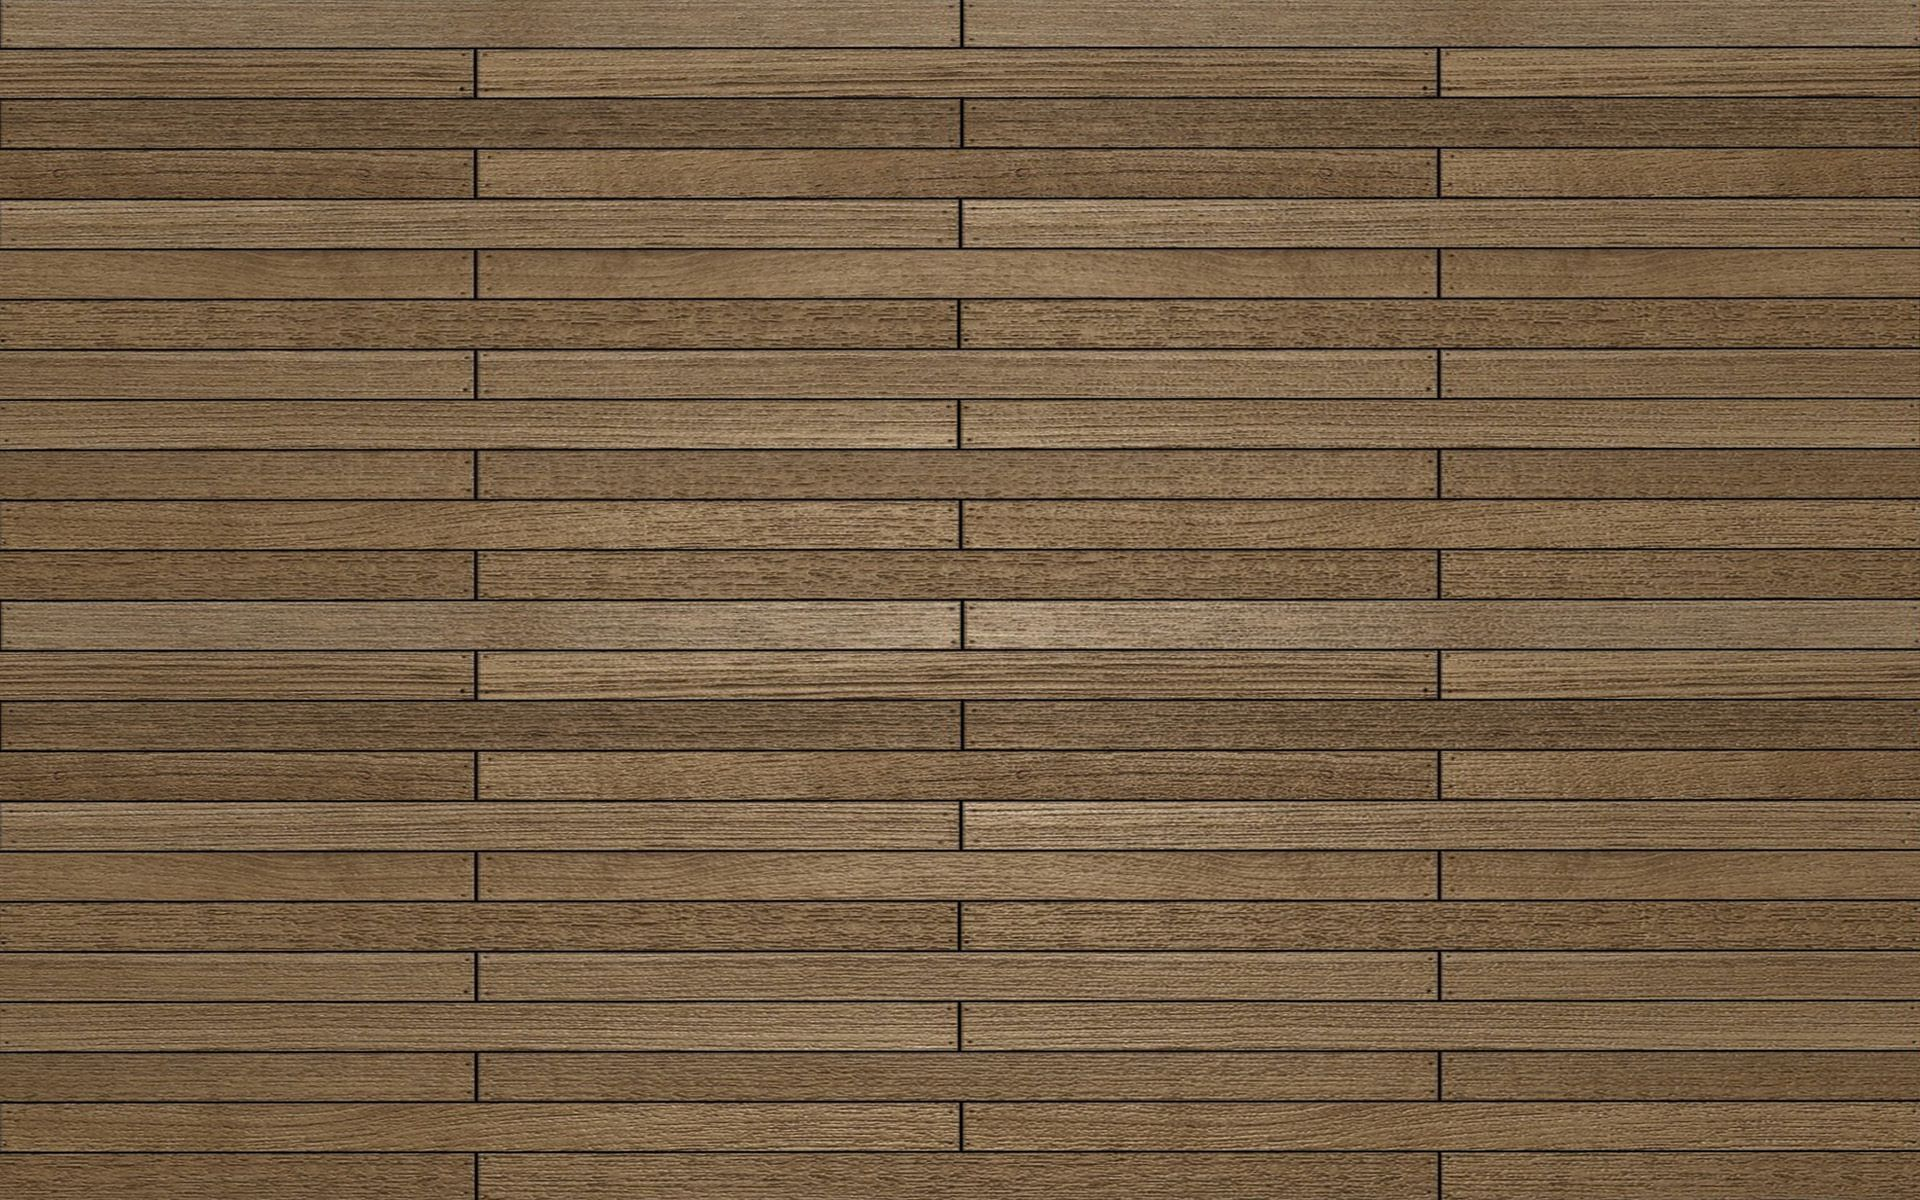 Wood tile floors dark wood floors hardwood floor wood floor pattern floor patterns floor wallpaper floor texture floor design barbie